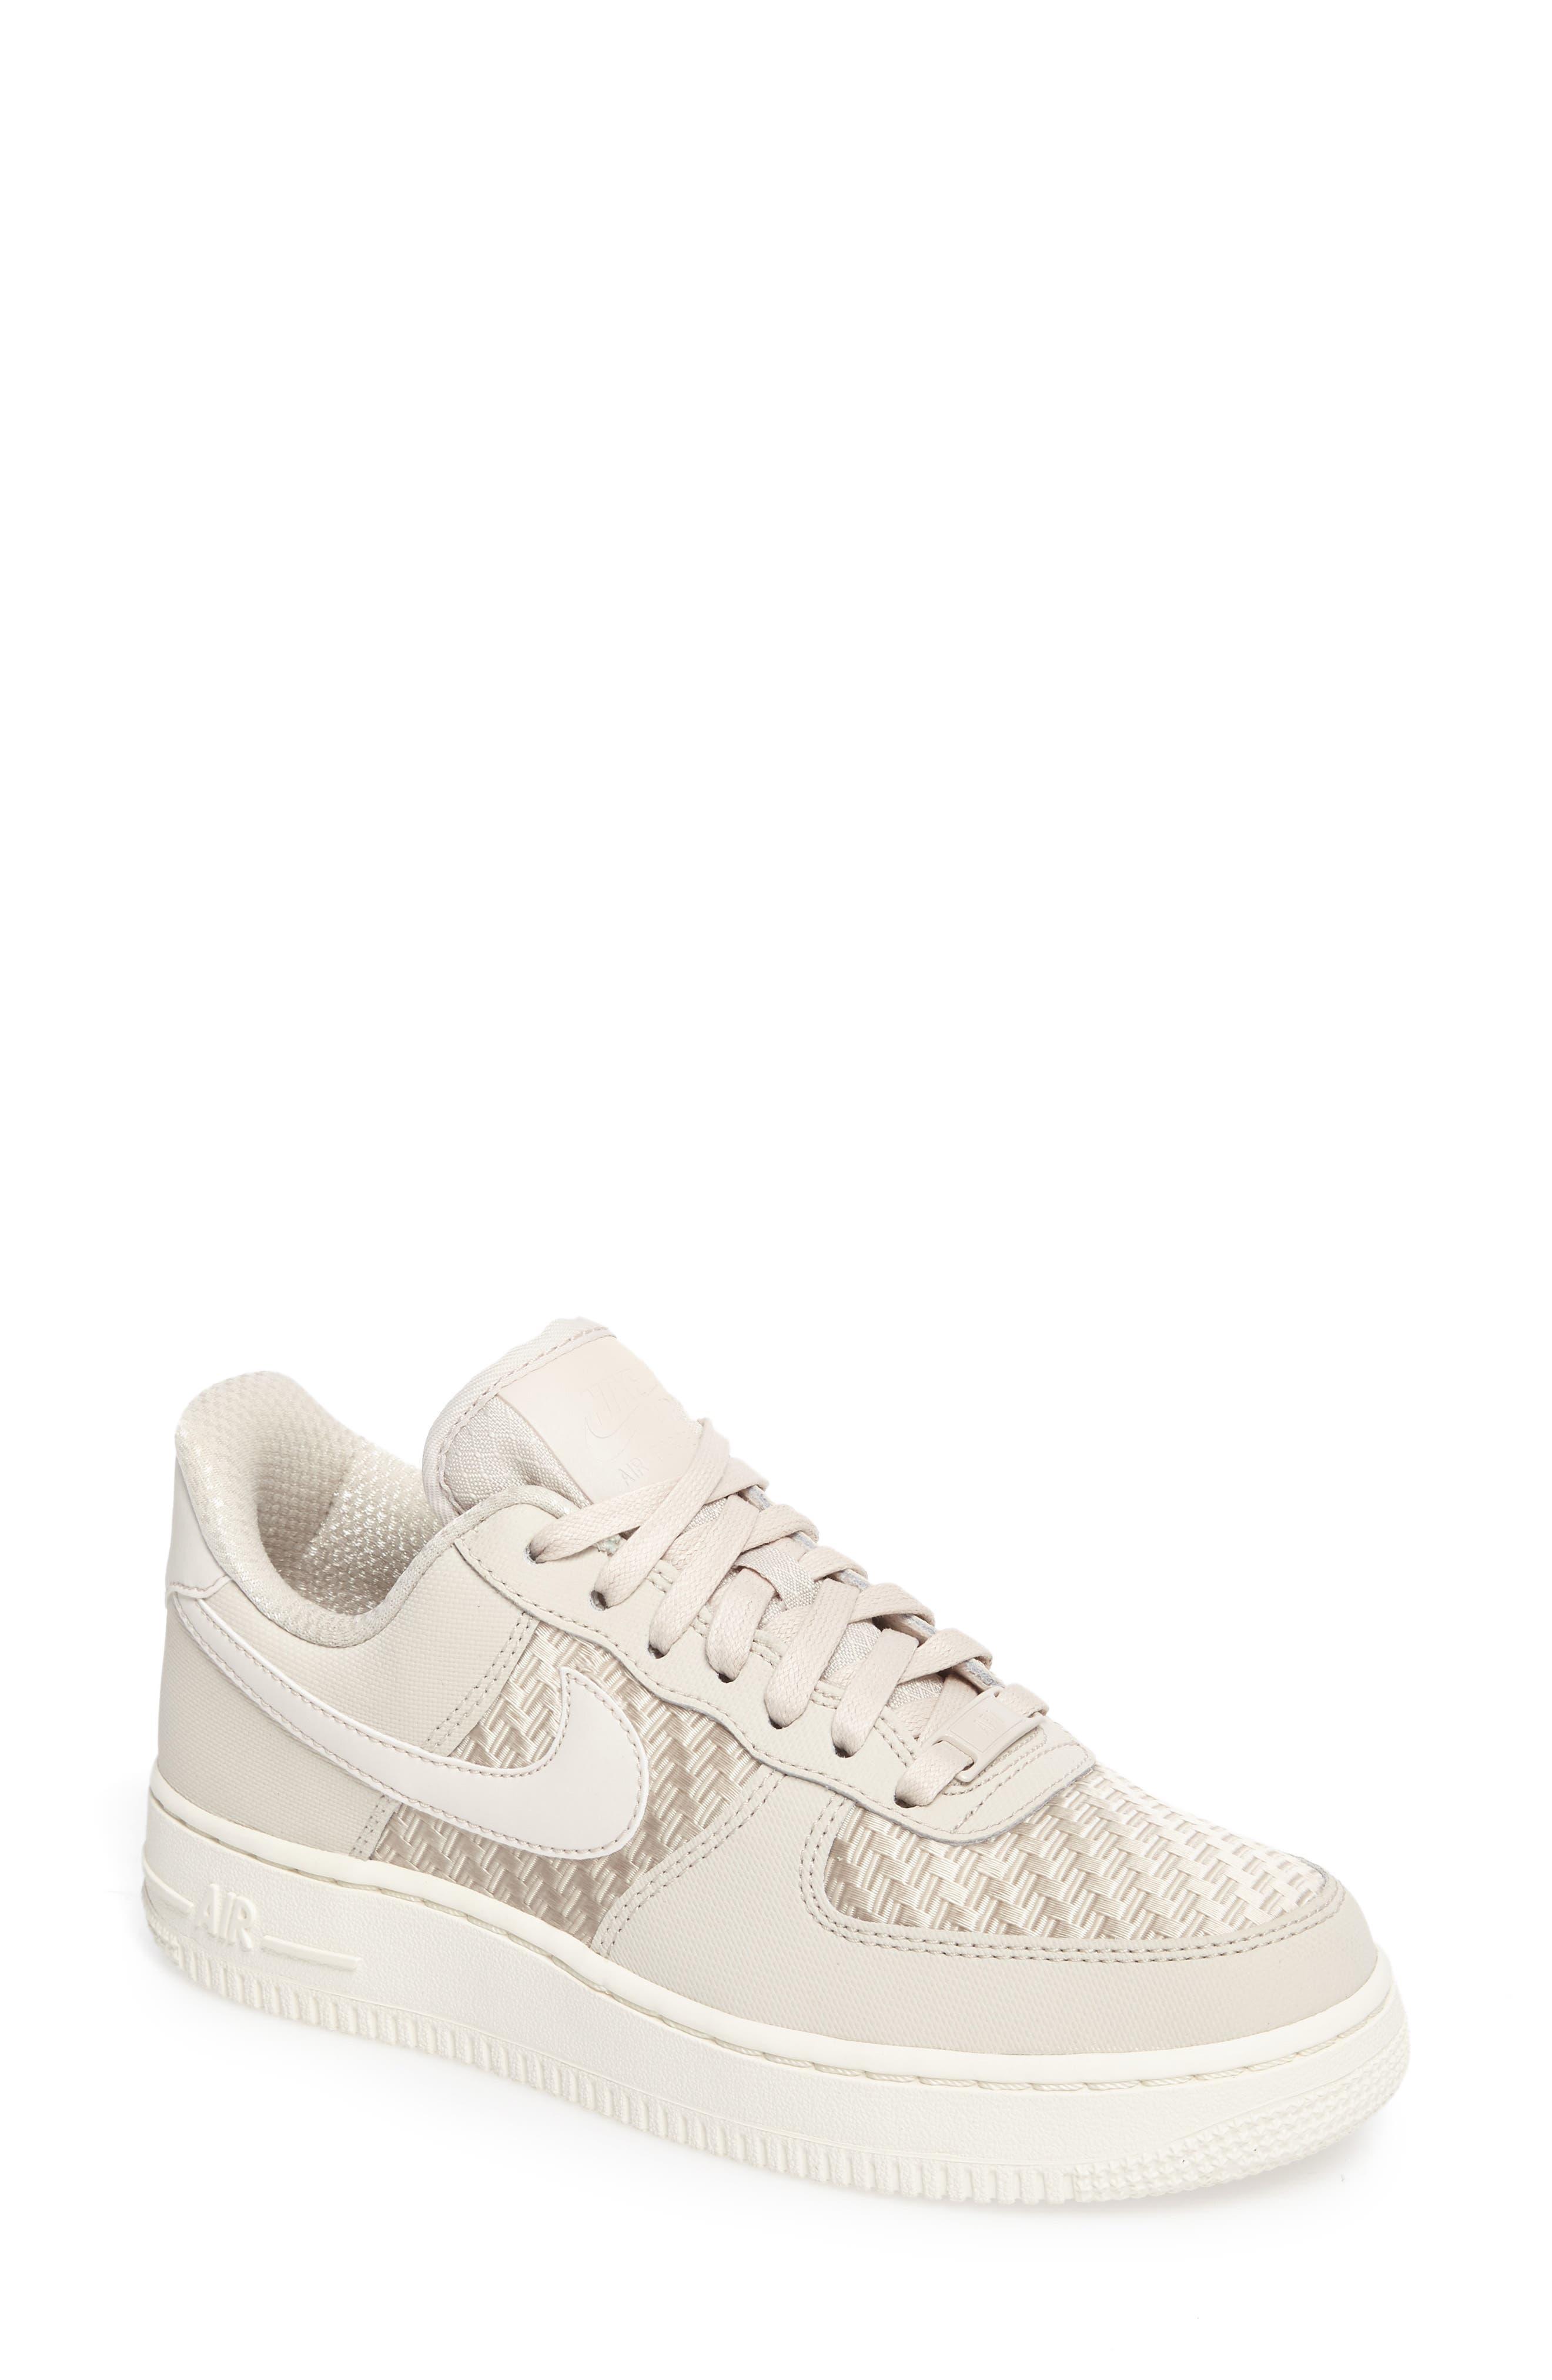 Air Force 1 '07 Pinnacle Sneaker,                             Main thumbnail 1, color,                             DESERT SAND/ DESERT SAND